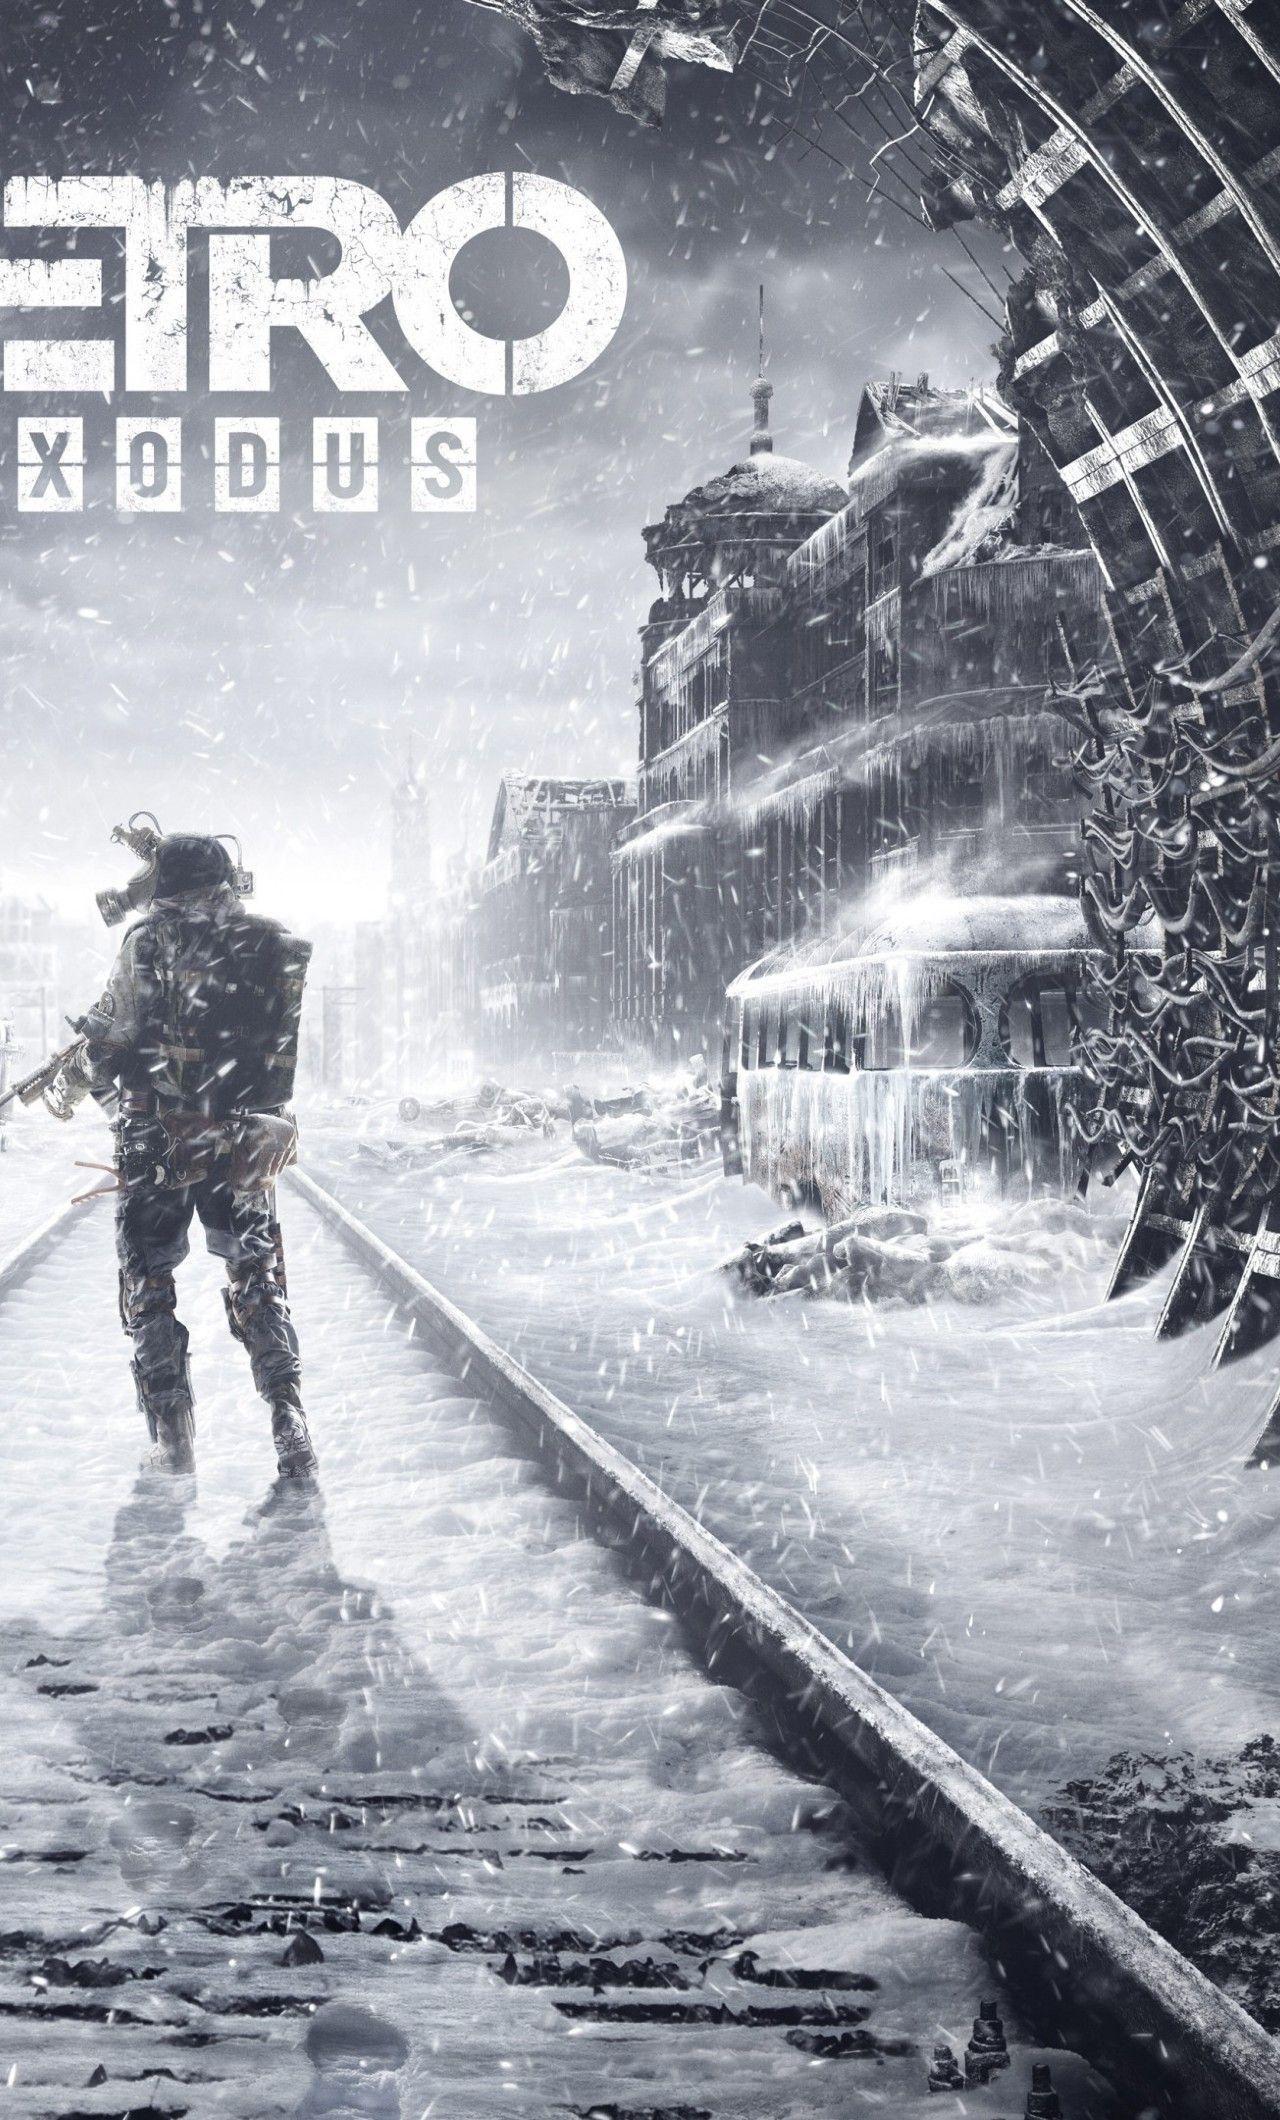 Metro Exodus Wallpapers - Top Free Metro Exodus ...